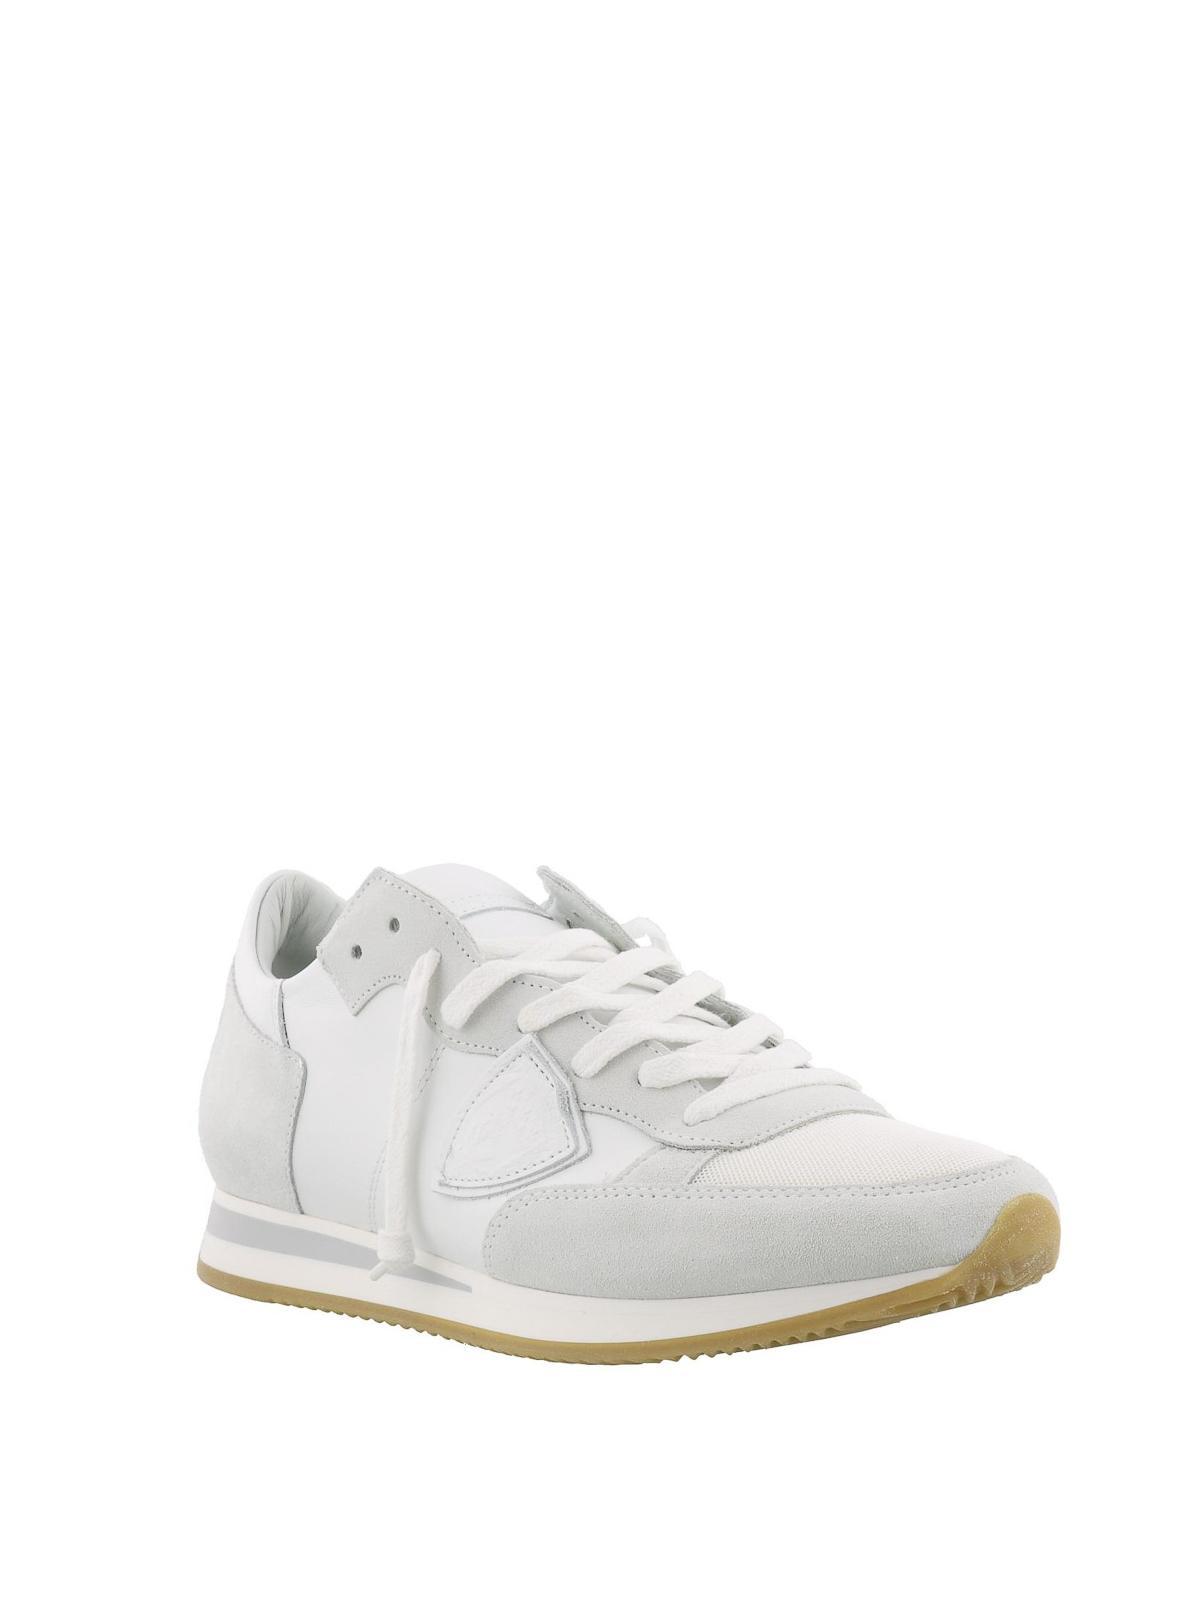 de Model sport 5001 Baskets TRLU Philippe Chaussures Tropez IgwzxHq